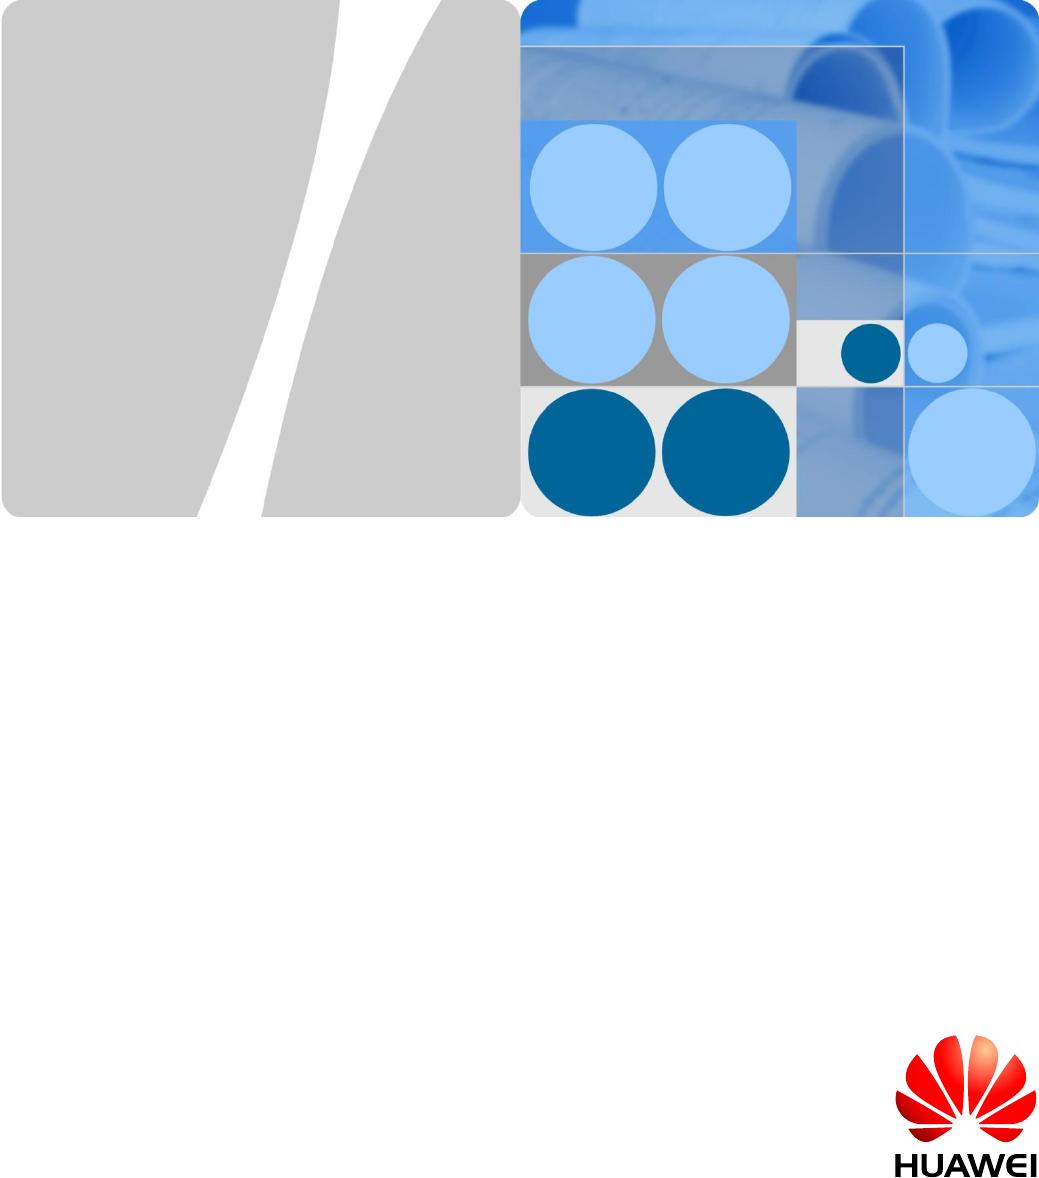 Huawei G8&G7plus Smartphone Basic FAQs V3 1 0906